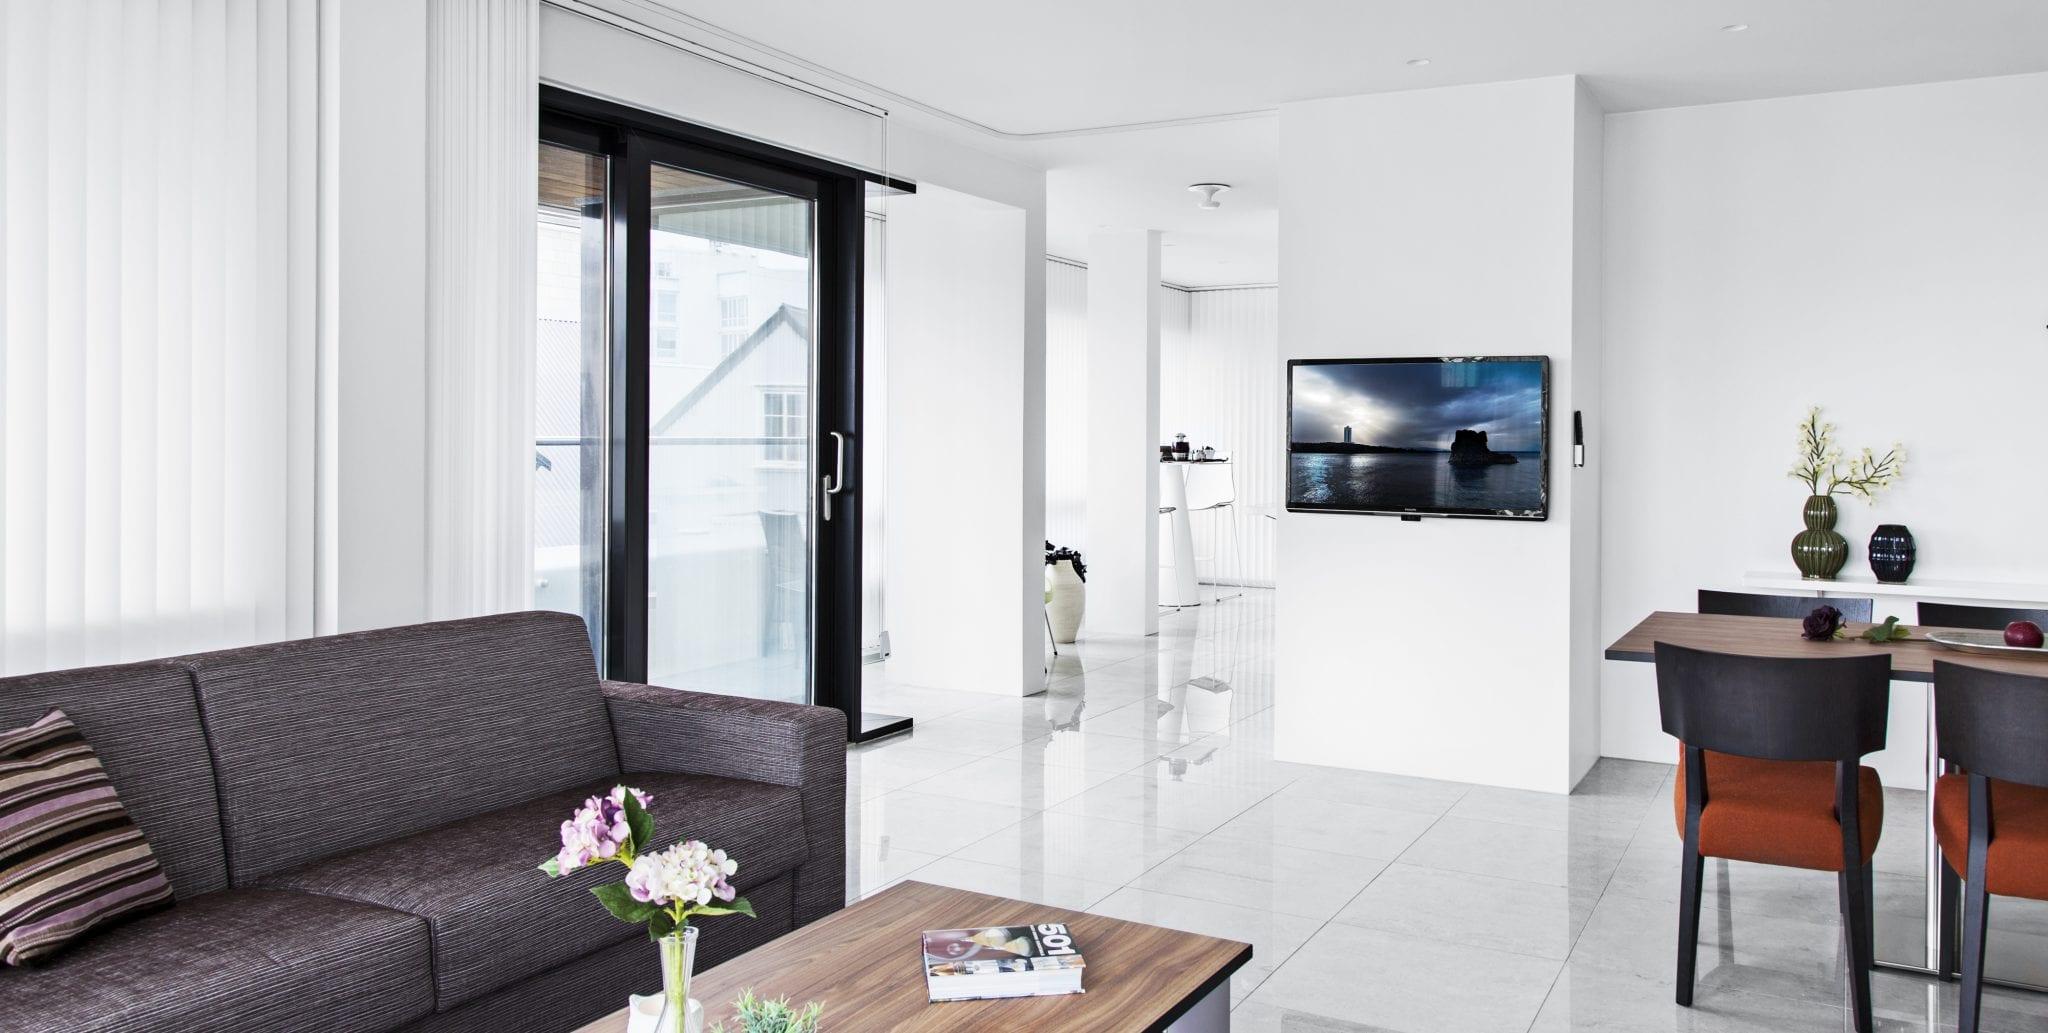 Deluxe Suite with 1 - 2 bedrooms